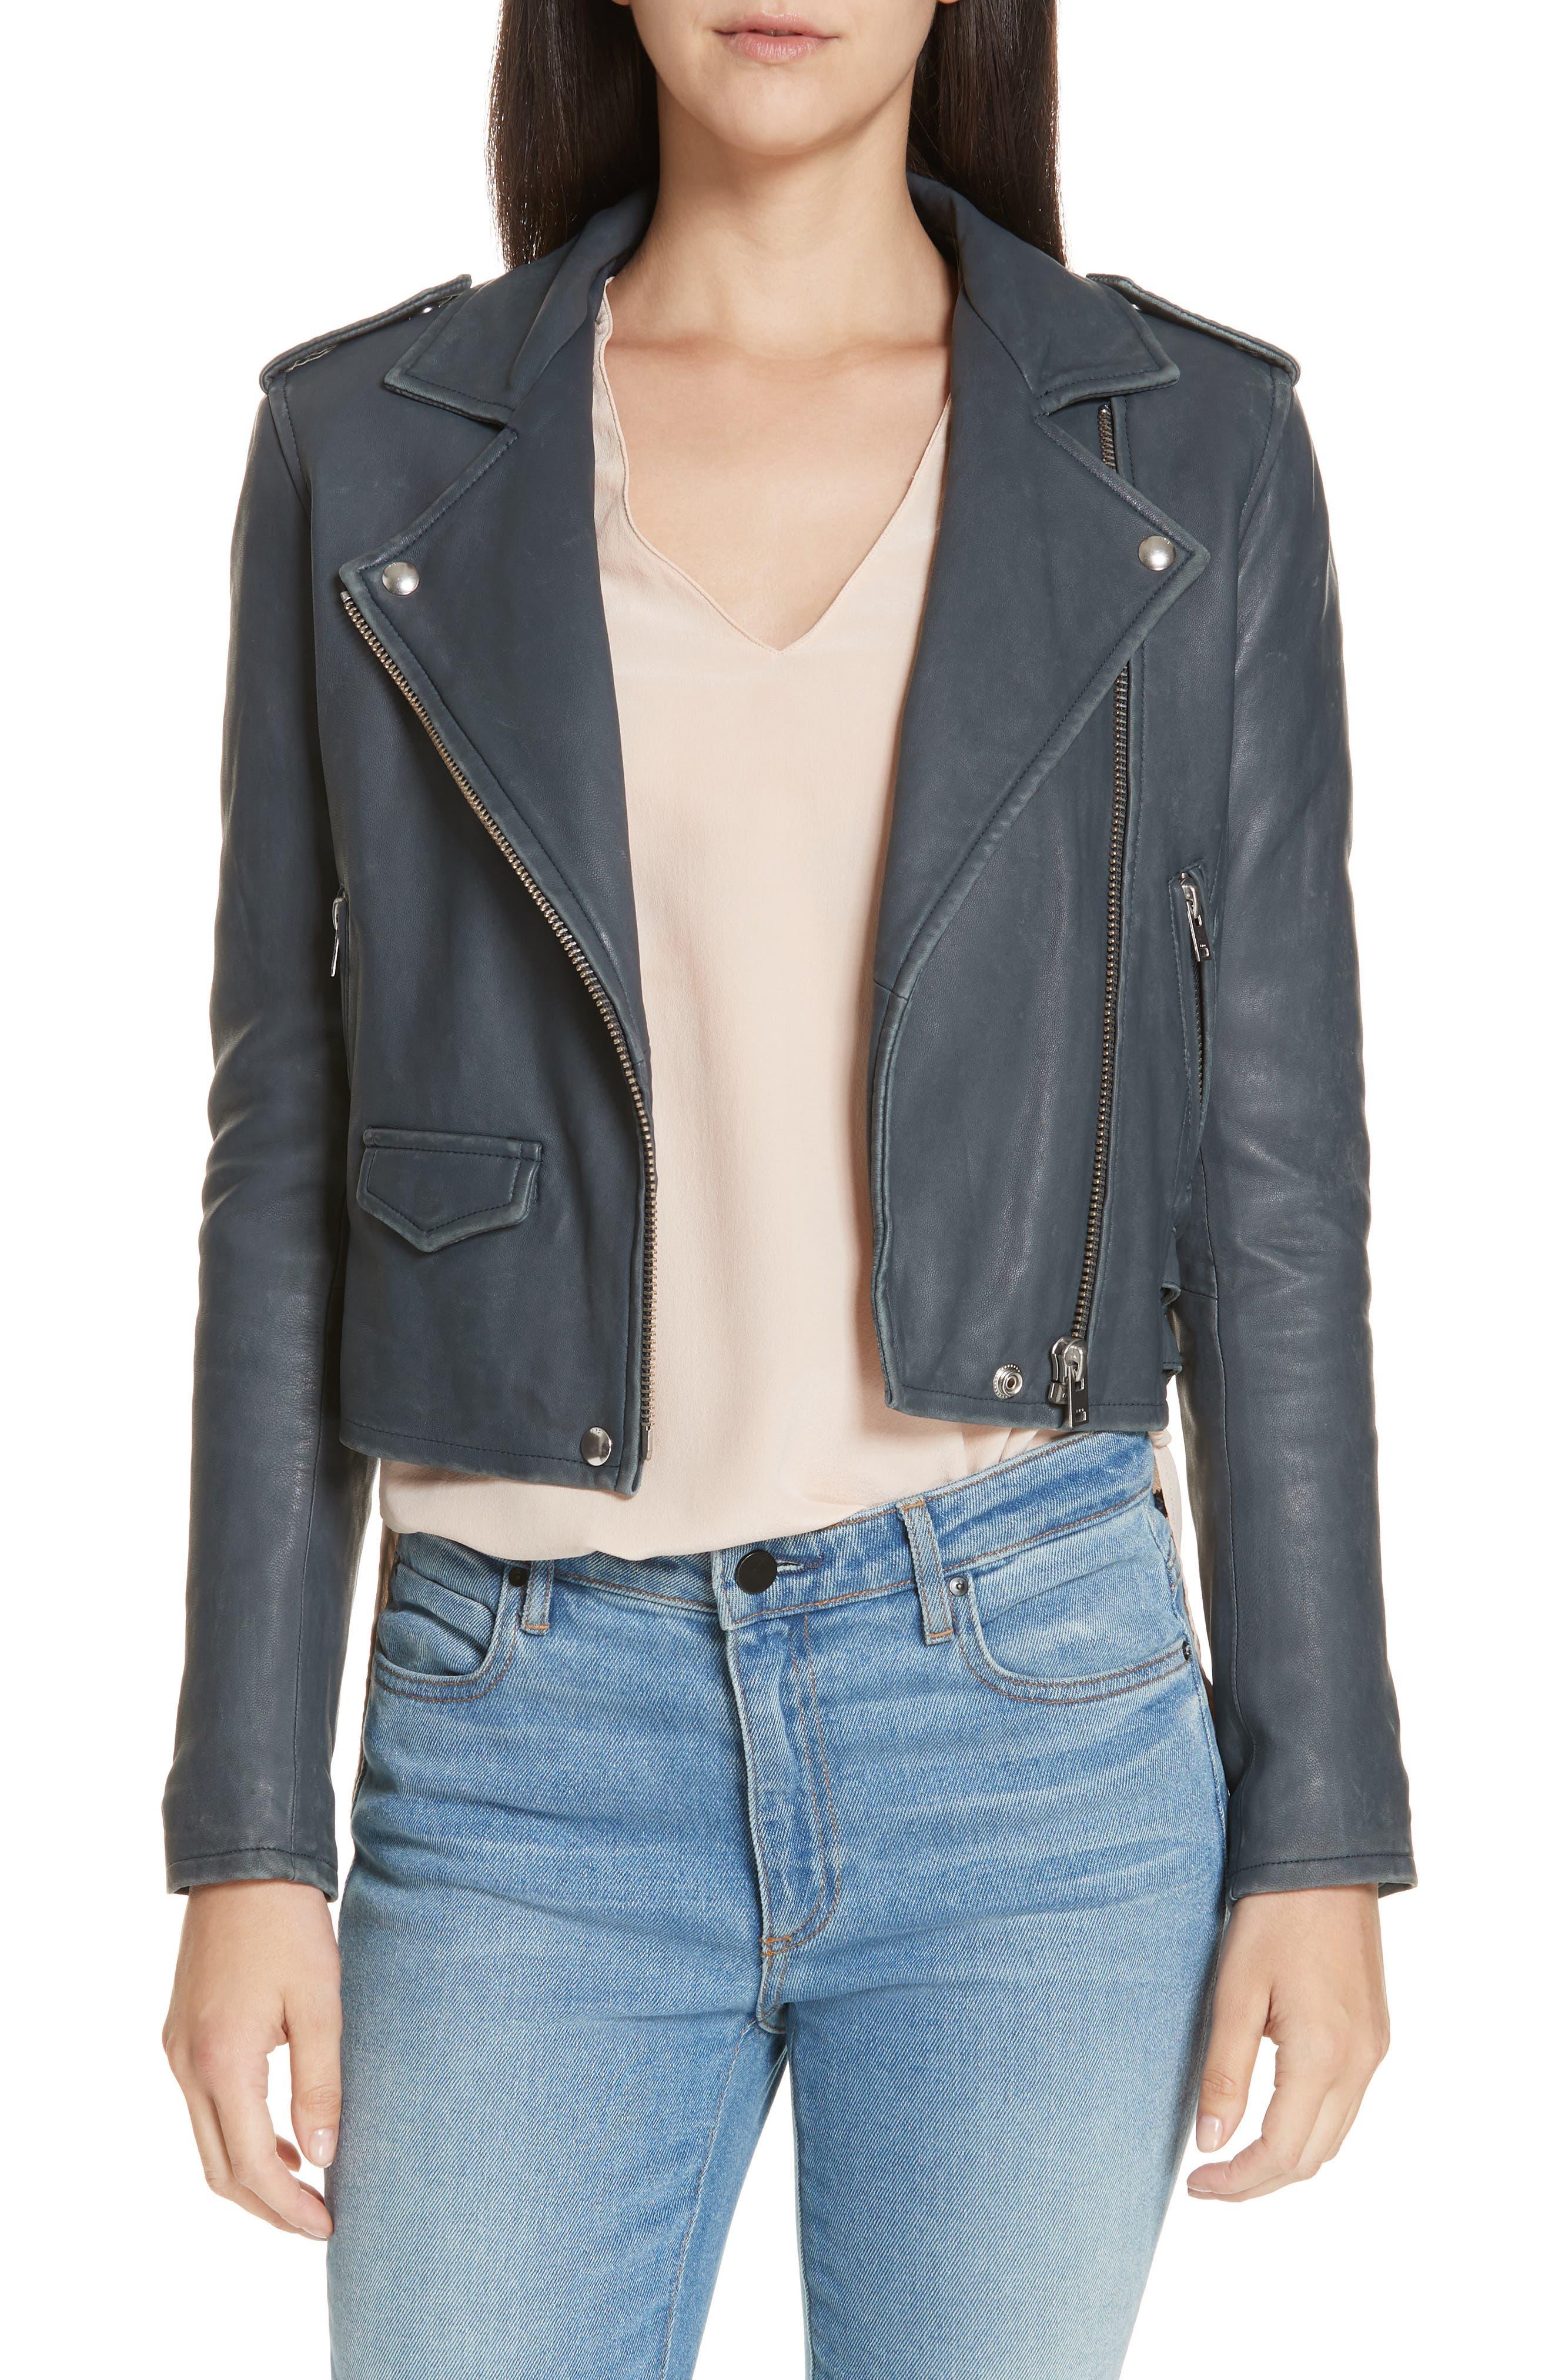 IRO 'Ashville' Leather Jacket, Main, color, GREY DENIM